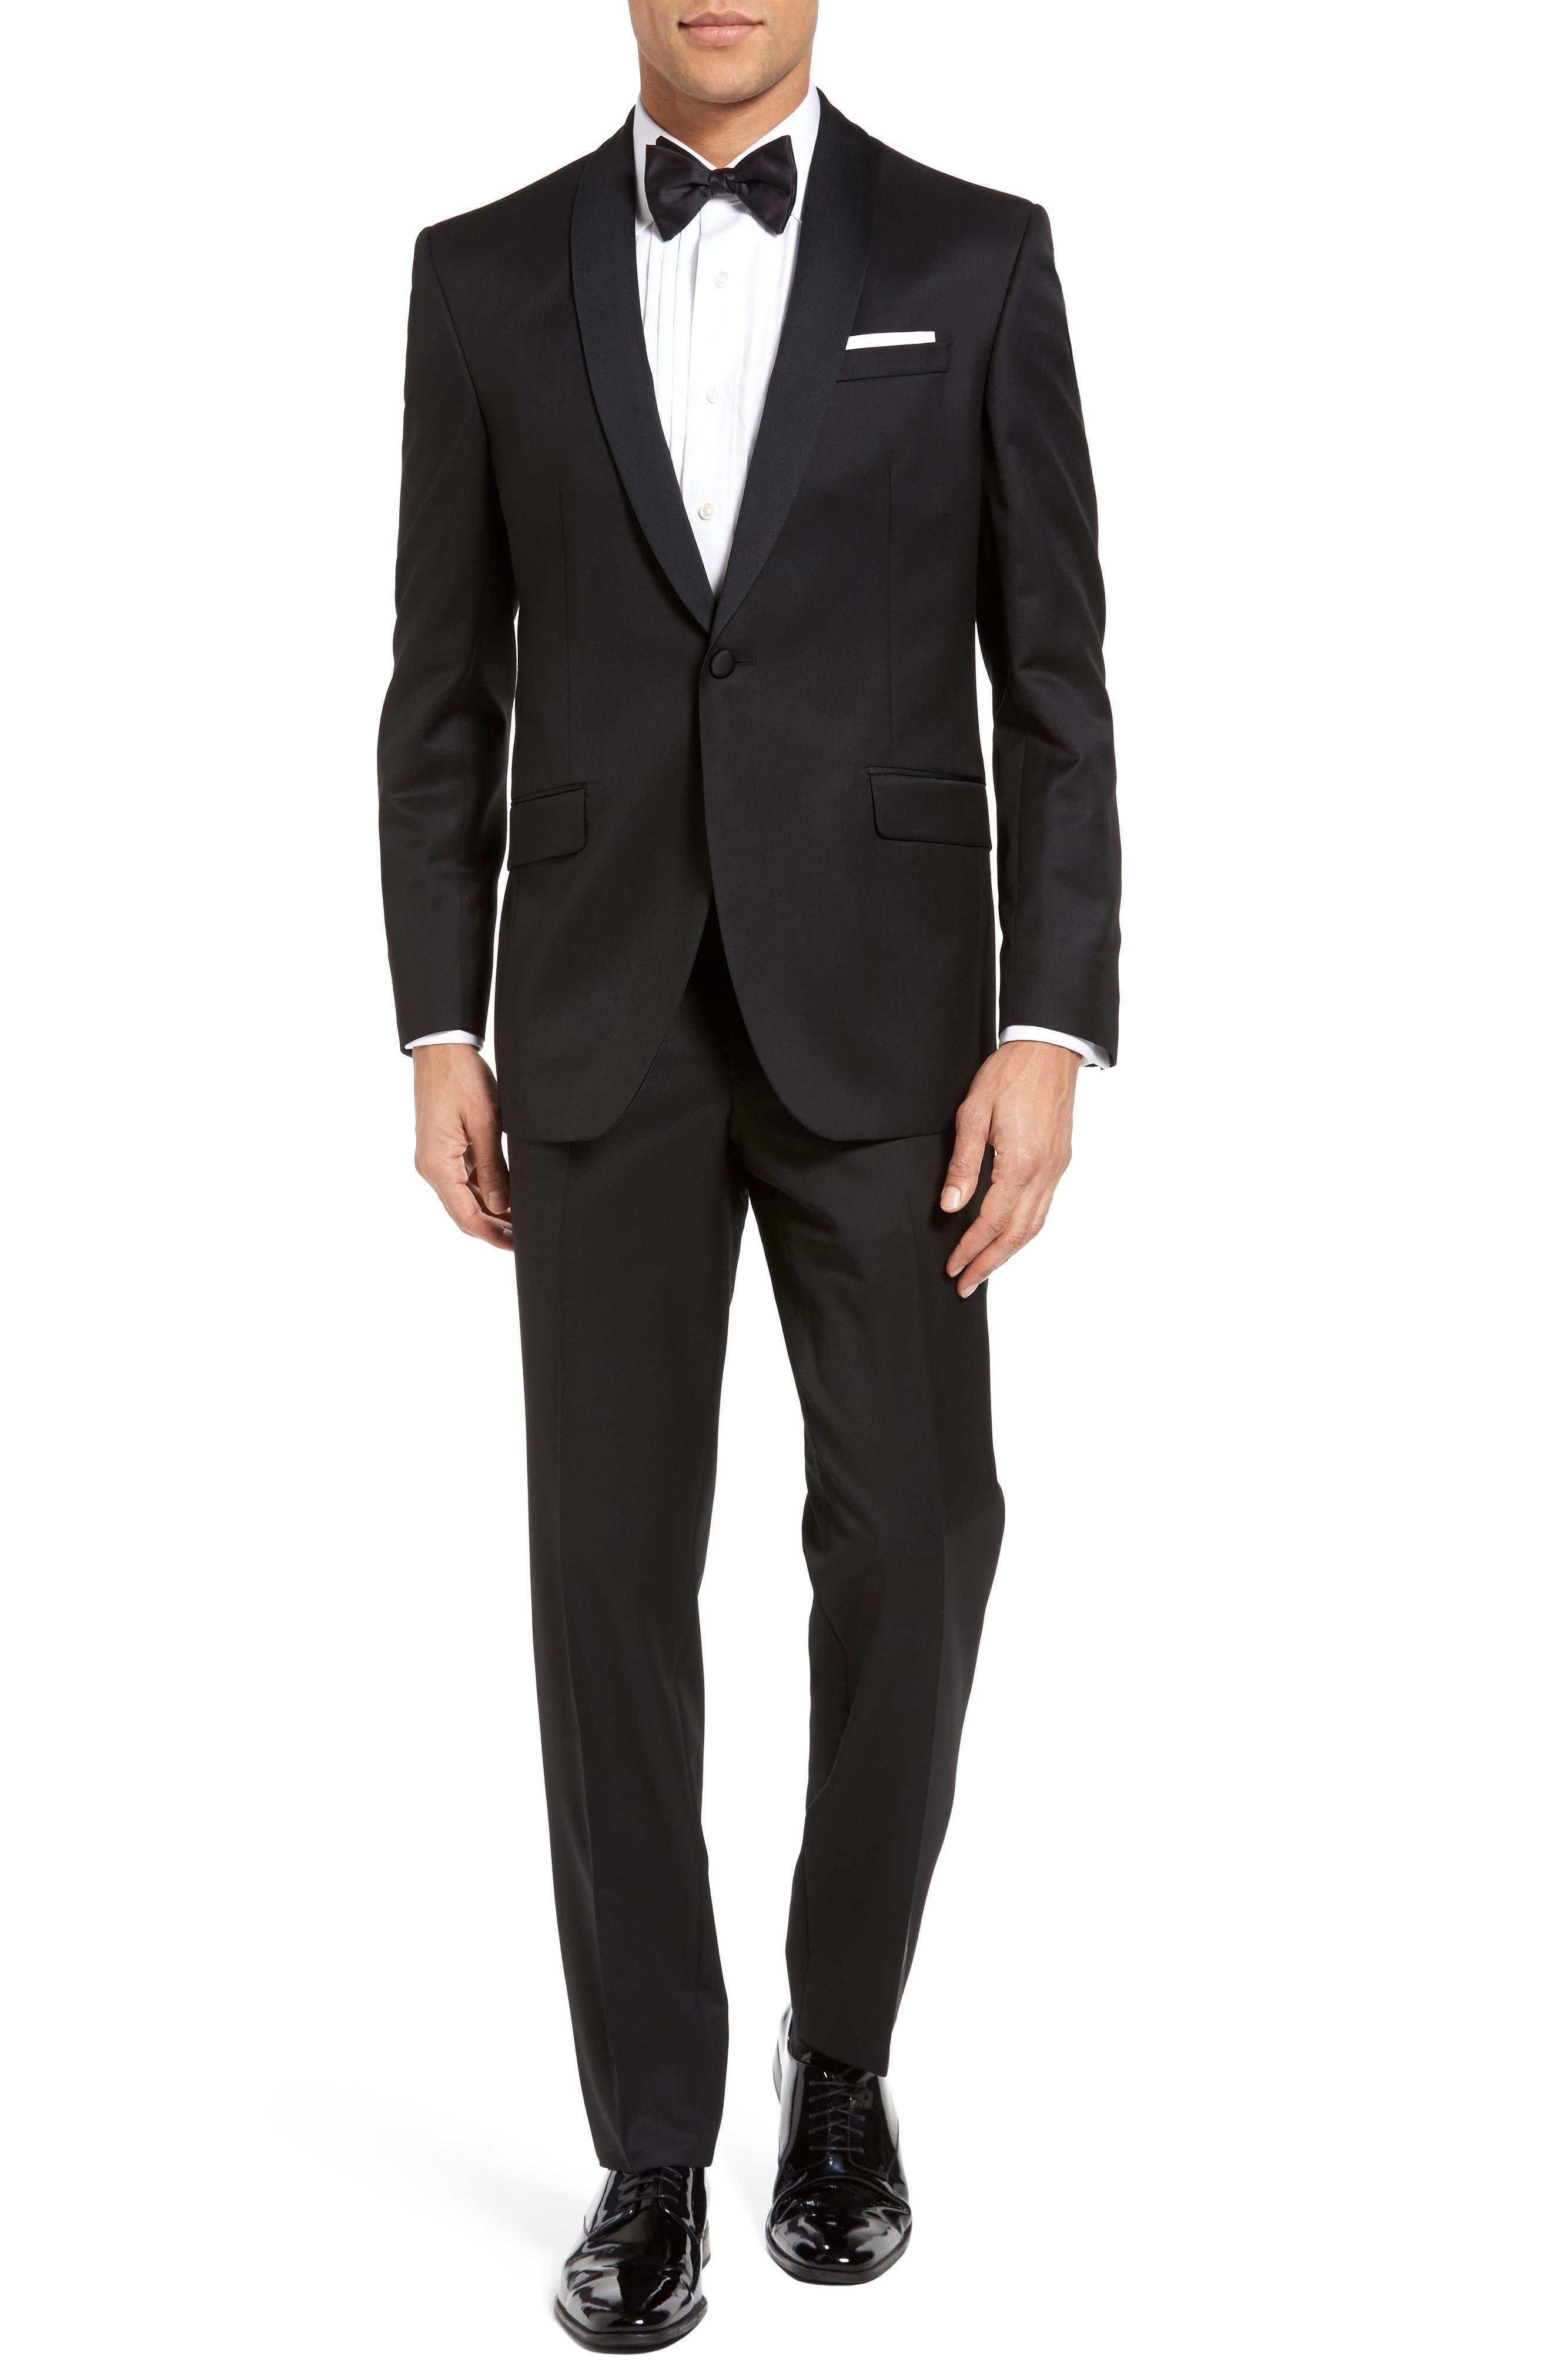 TED BAKER LONDON Josh Trim Fit Wool & Mohair Tuxedo, Main, color, BLACK